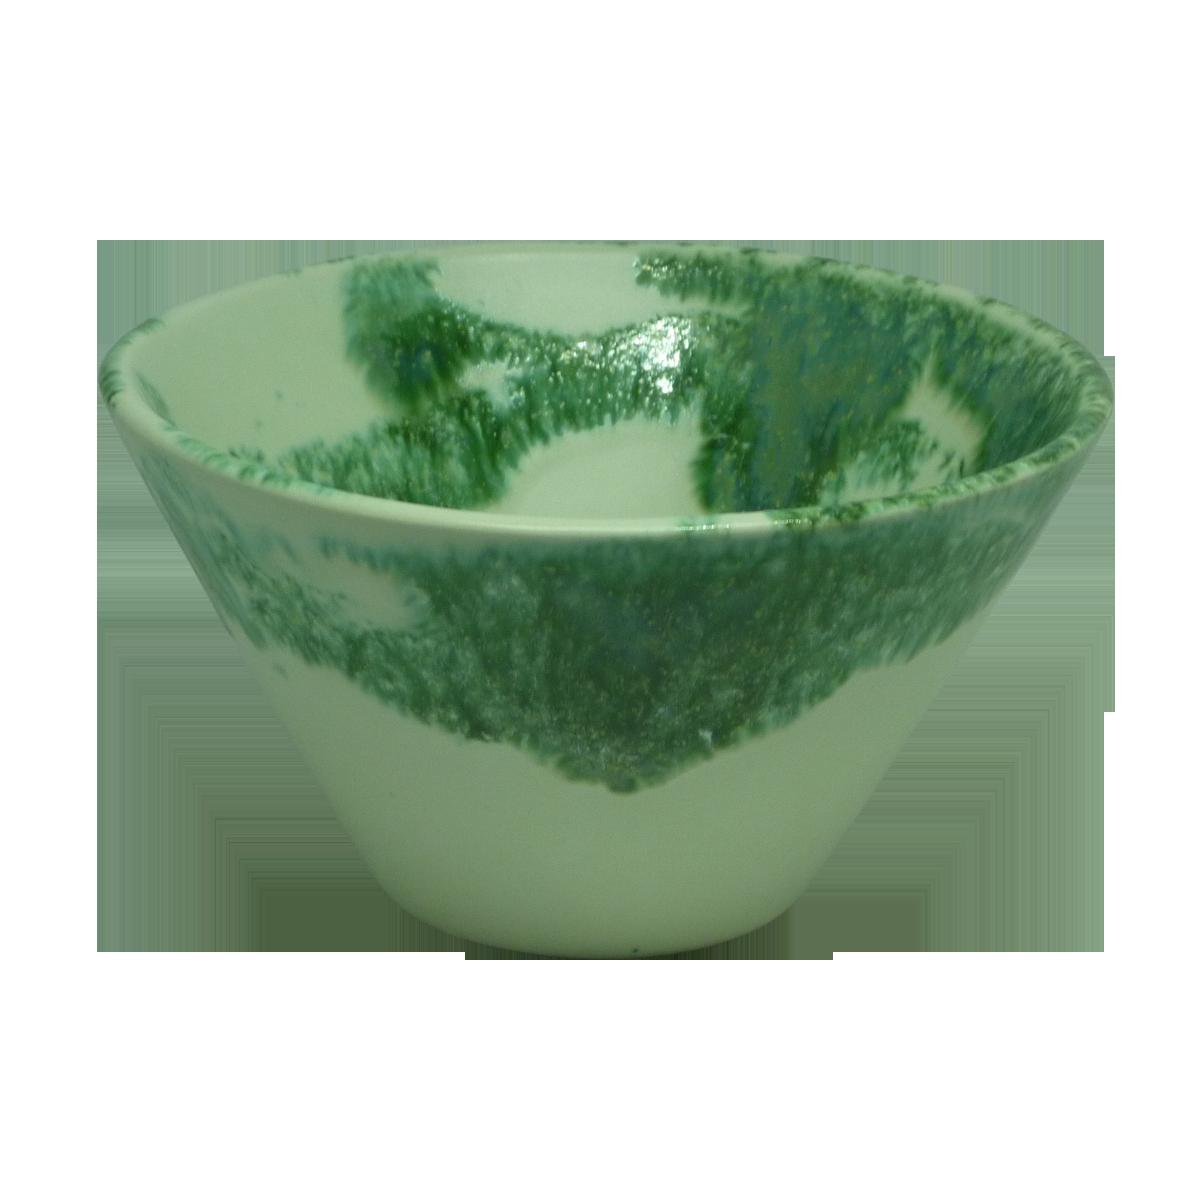 Esprit Cuistot - Bol Chlorophylle vert en céramique